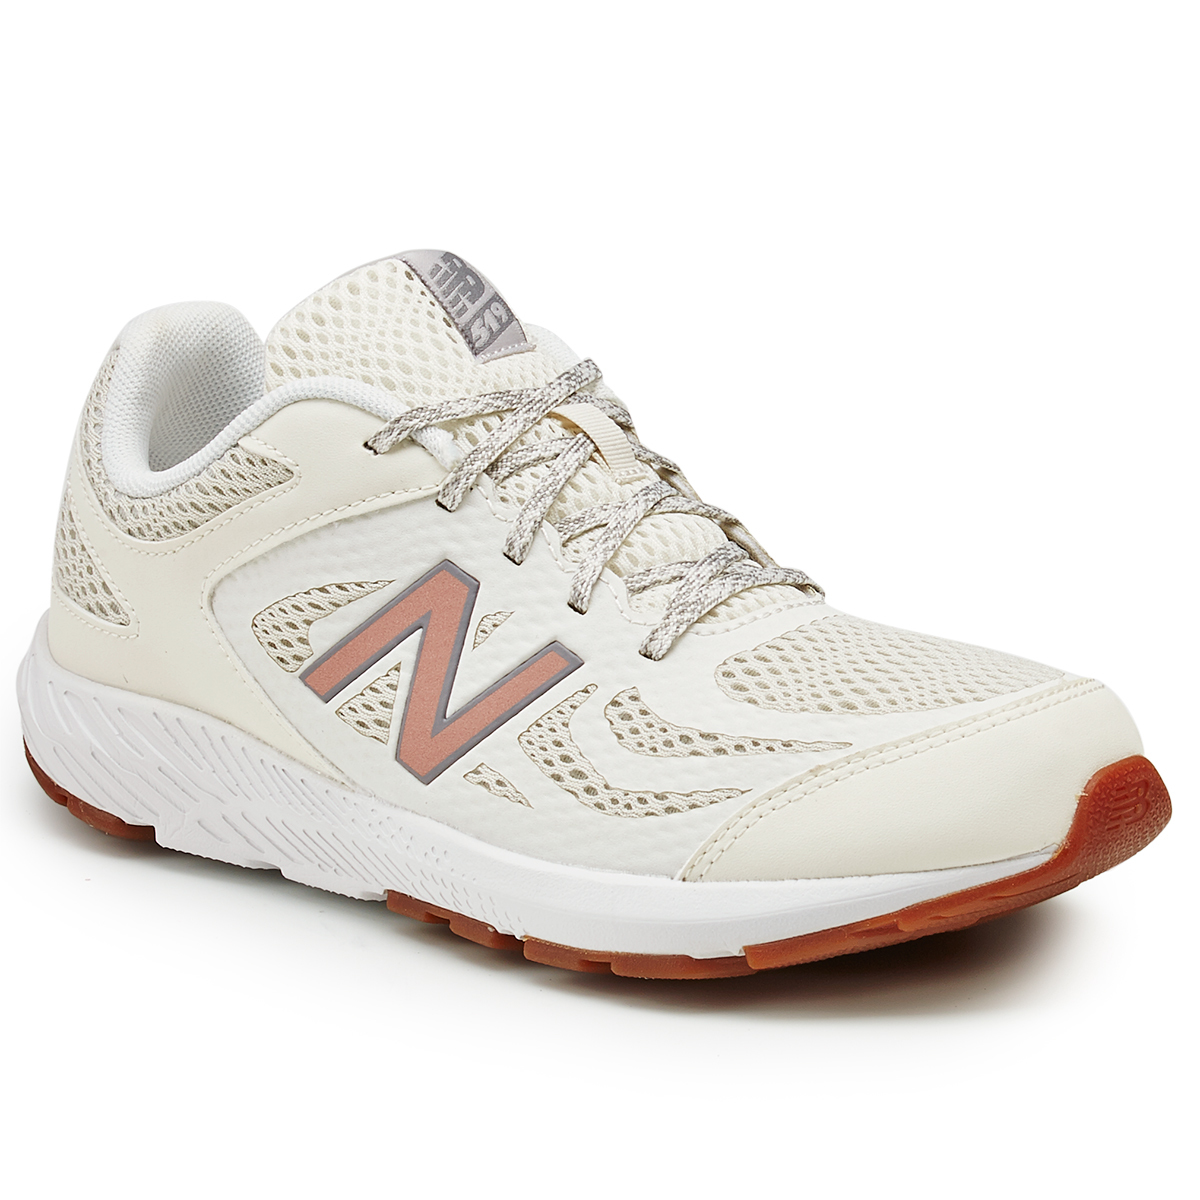 New Balance Big Girls' 519V1 Running Shoes - White, 4.5